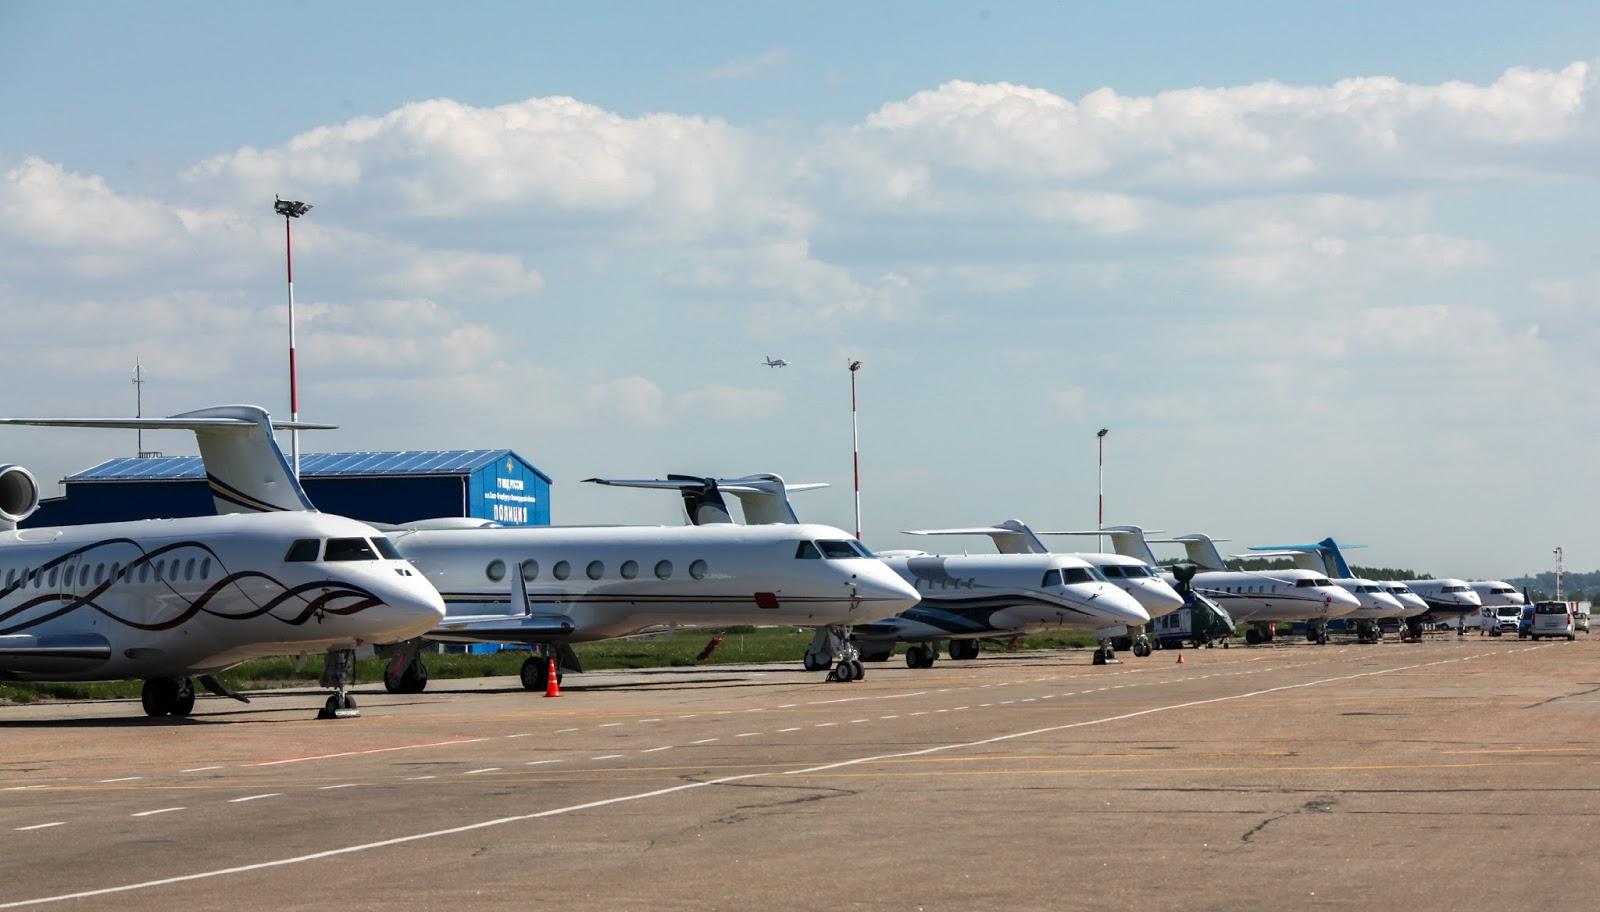 Pulkovo opens new terminal